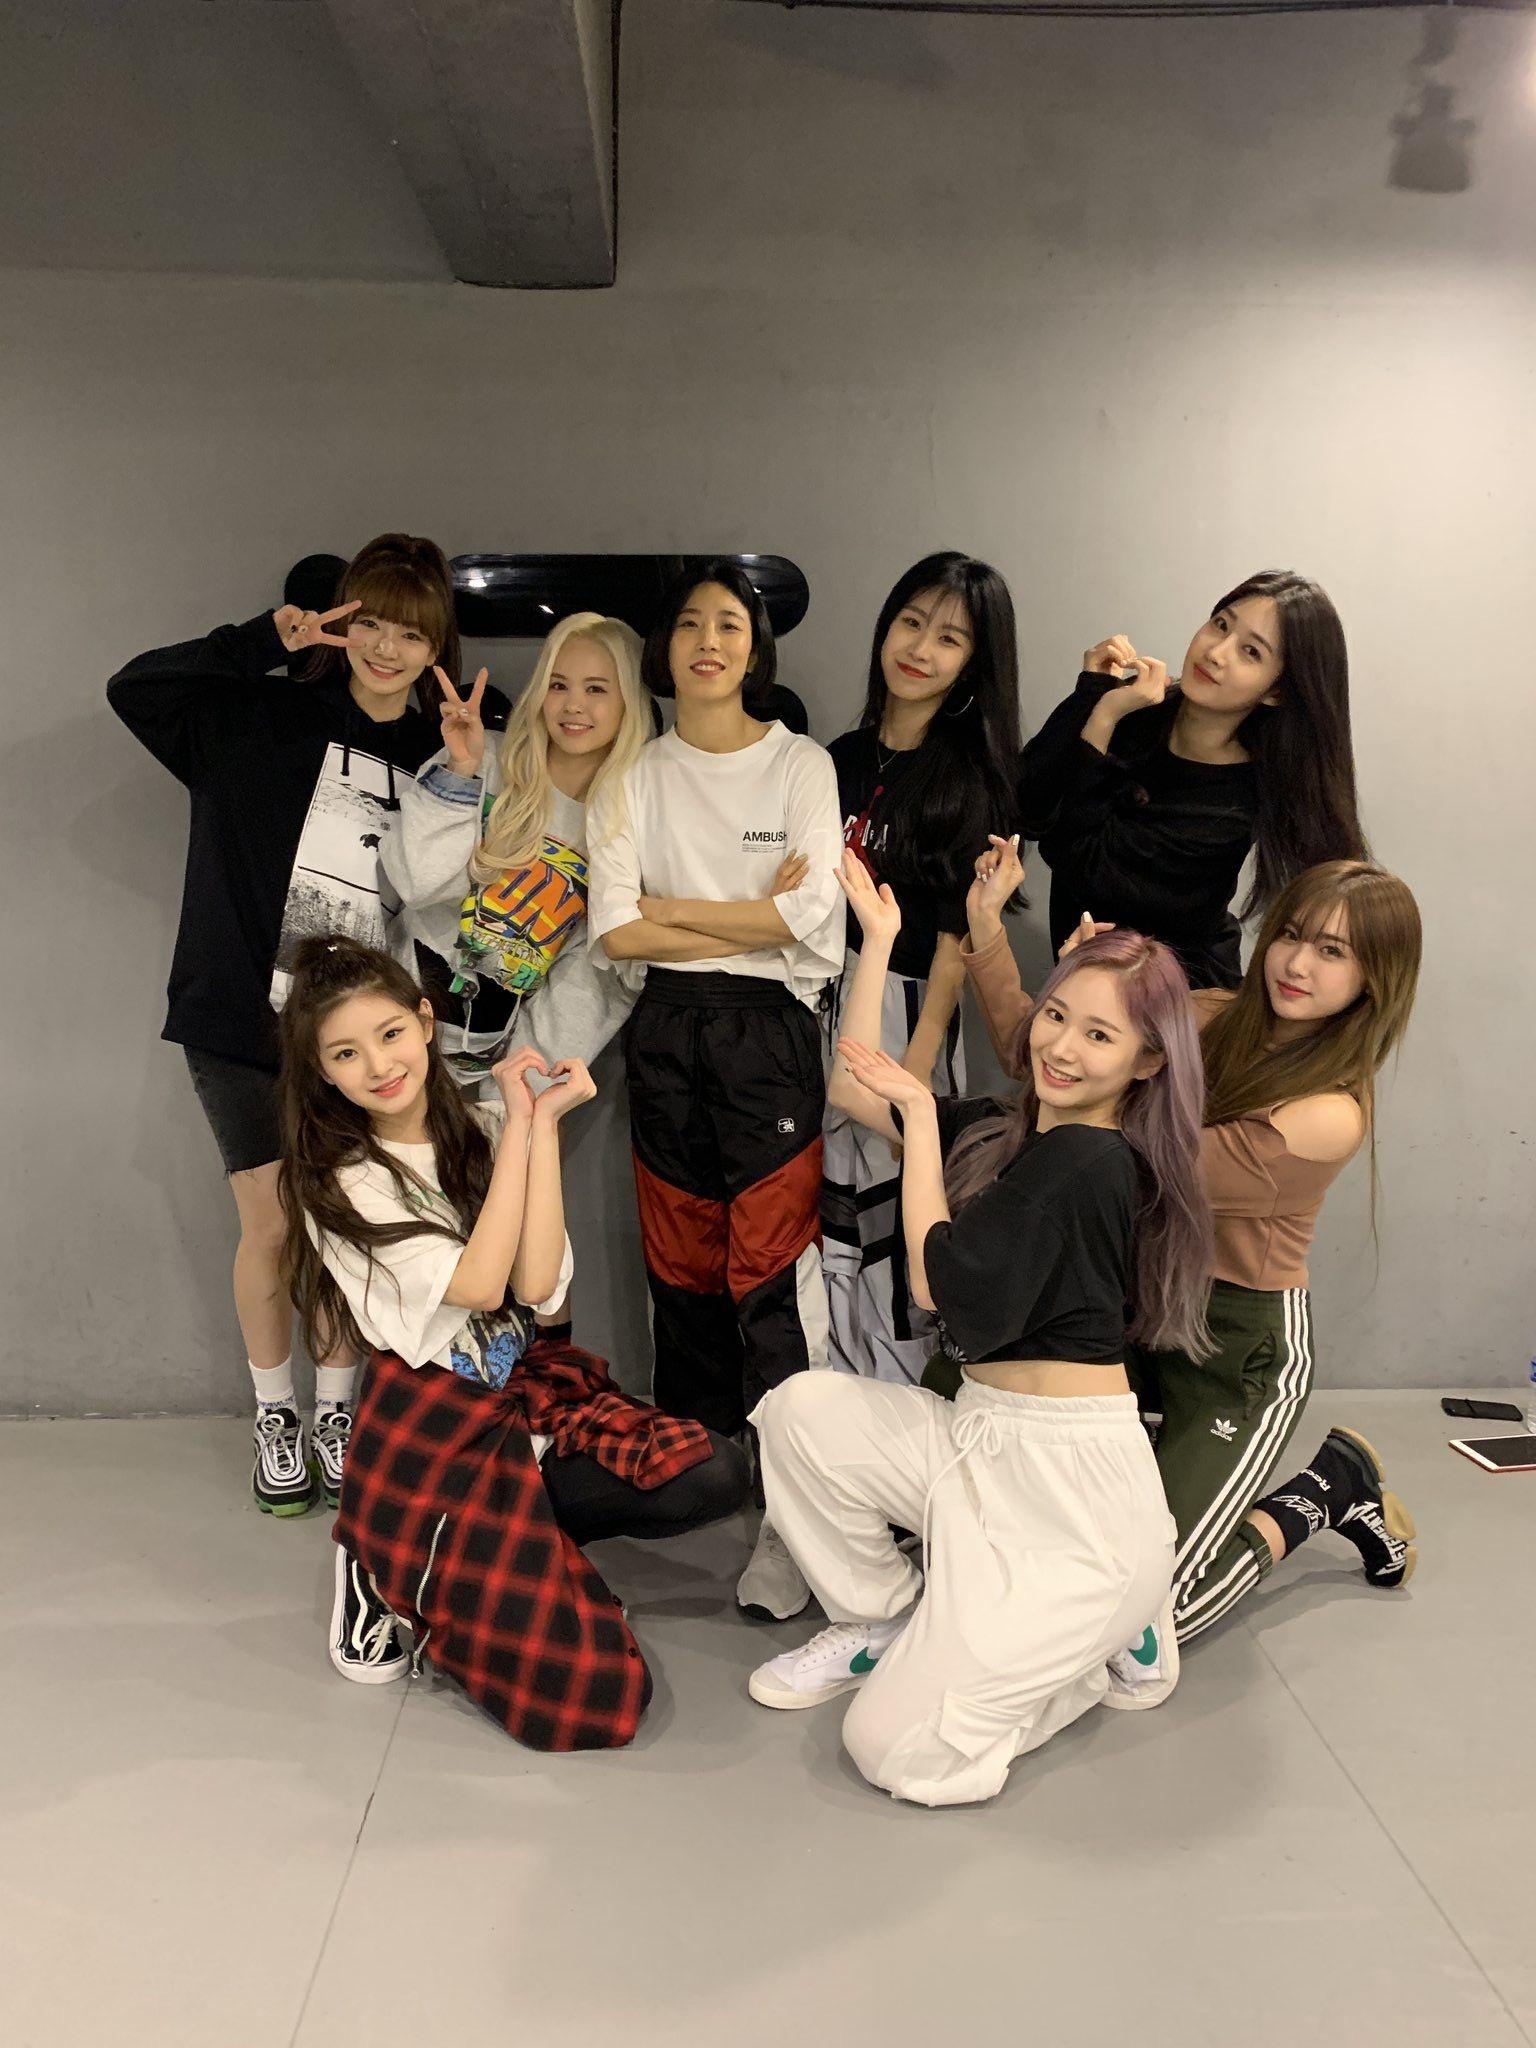 Everglow With Lia Kim At 1million Dance Studio Kpop Girls Kpop Girl Groups Korean Girl Groups